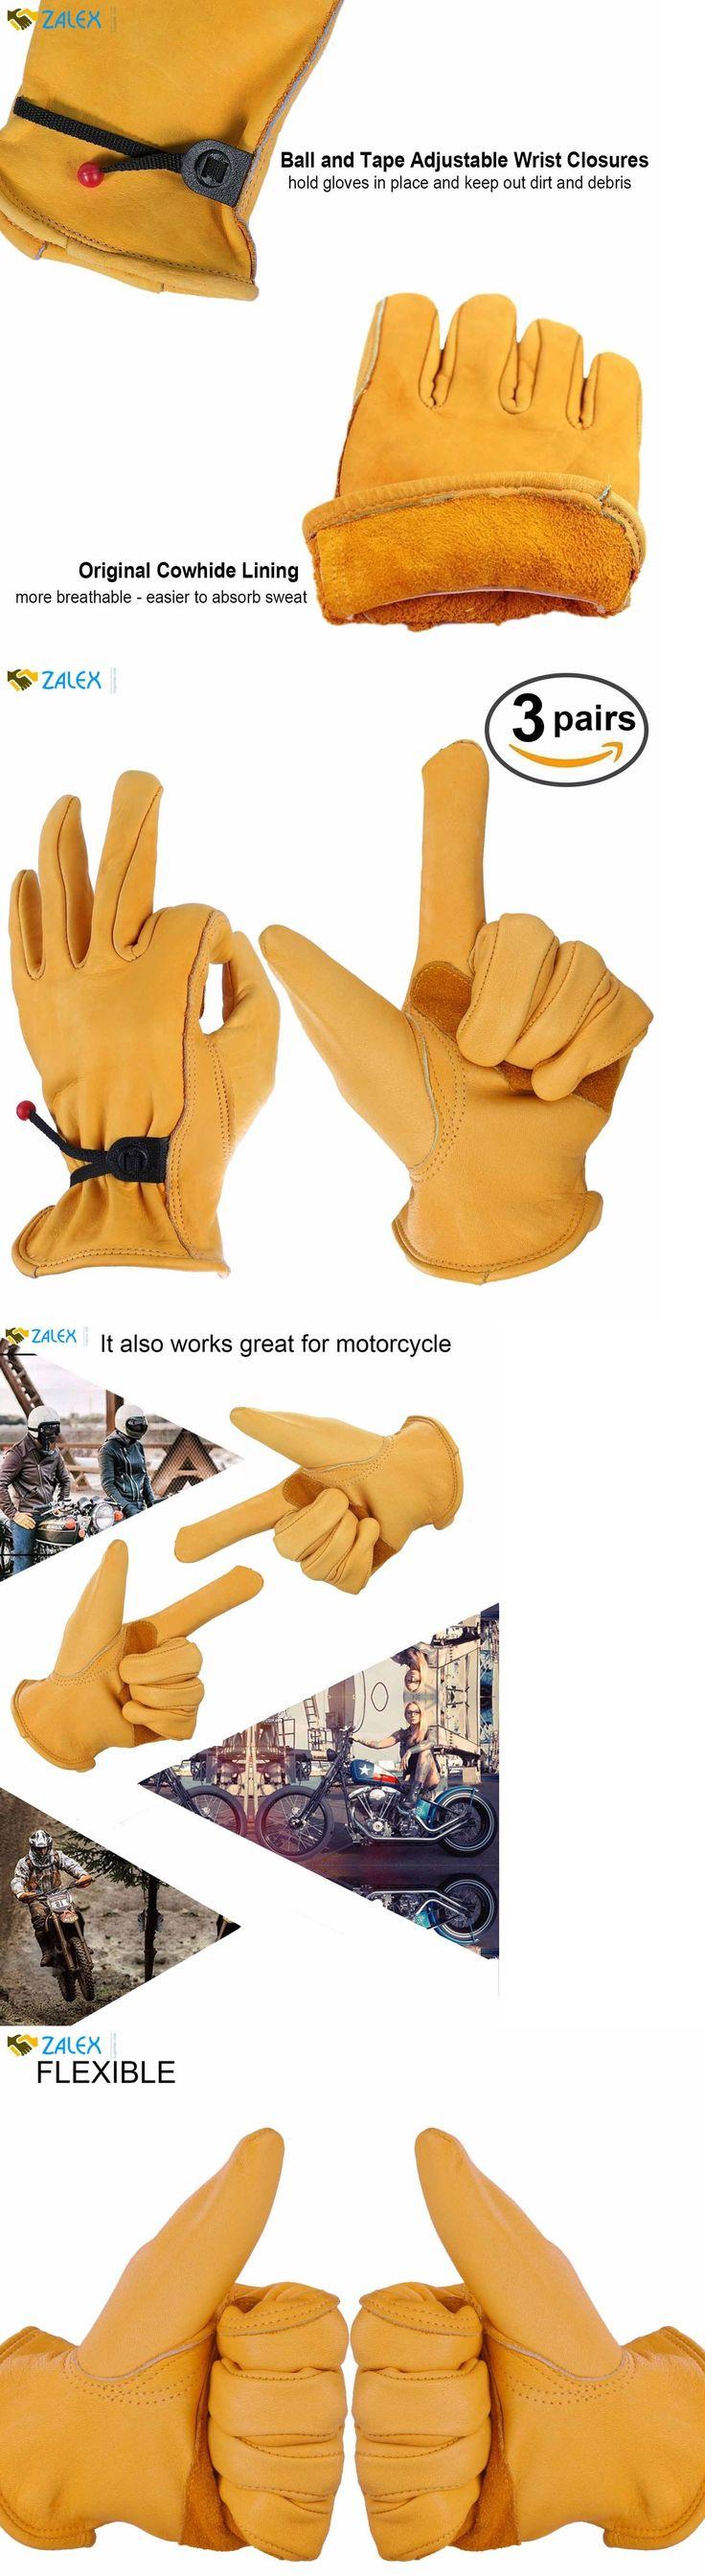 Leather work gloves ebay - Gardening Gloves 139864 Ozero Leather Work Gloves For Gardening Men Women With Adjustable Lederarbeitshandschuhegartenhandschuhelederverarbeitung